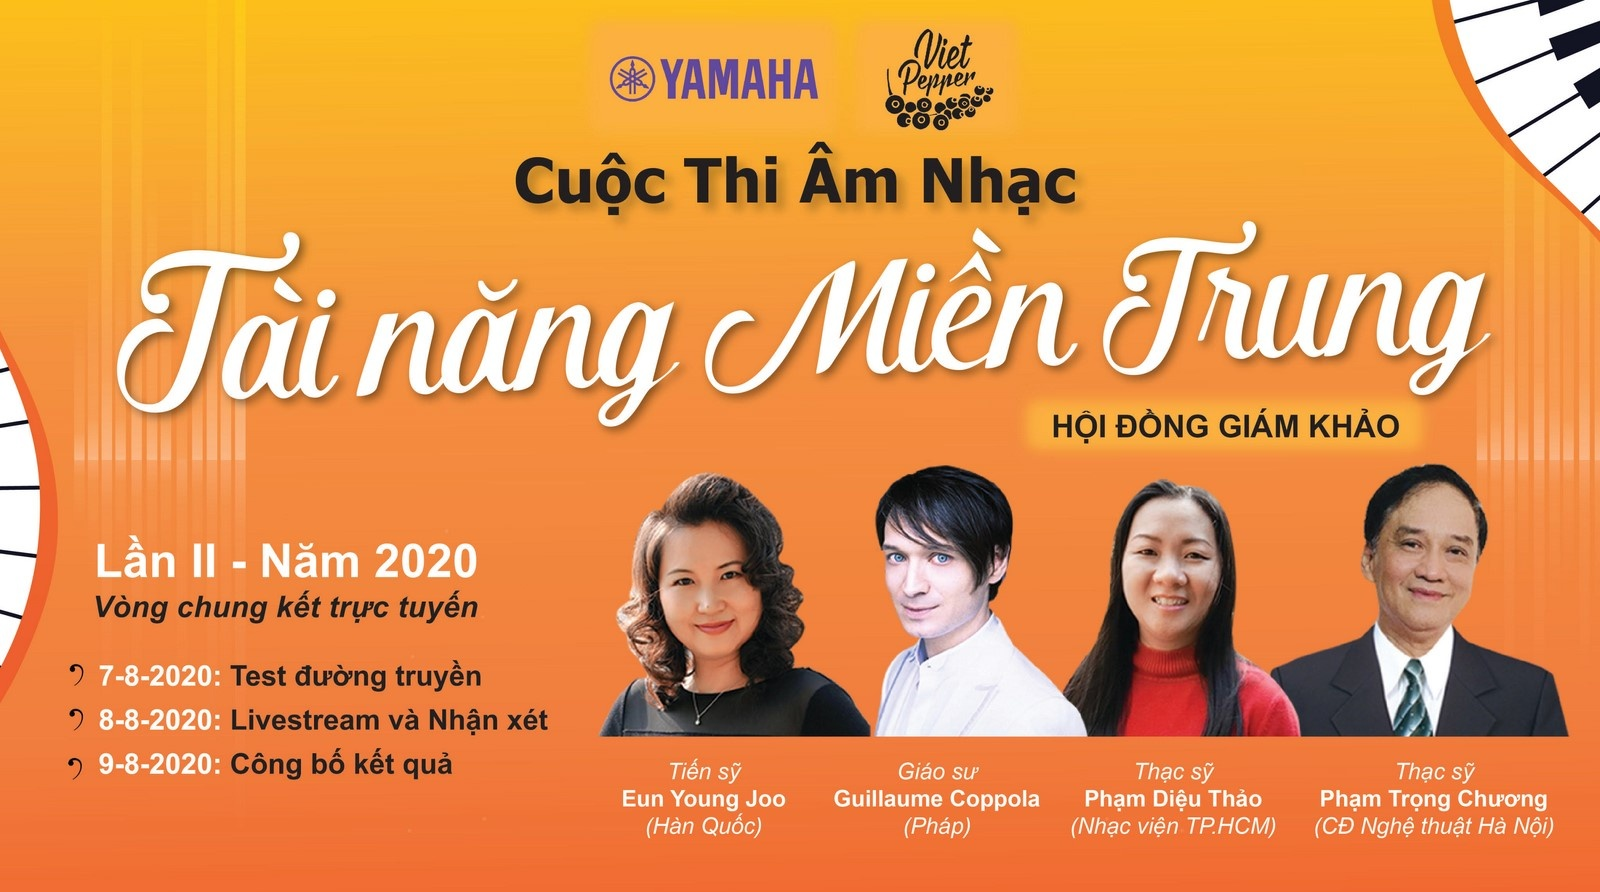 lan dau tien thi piano qua hinh thuc livestream